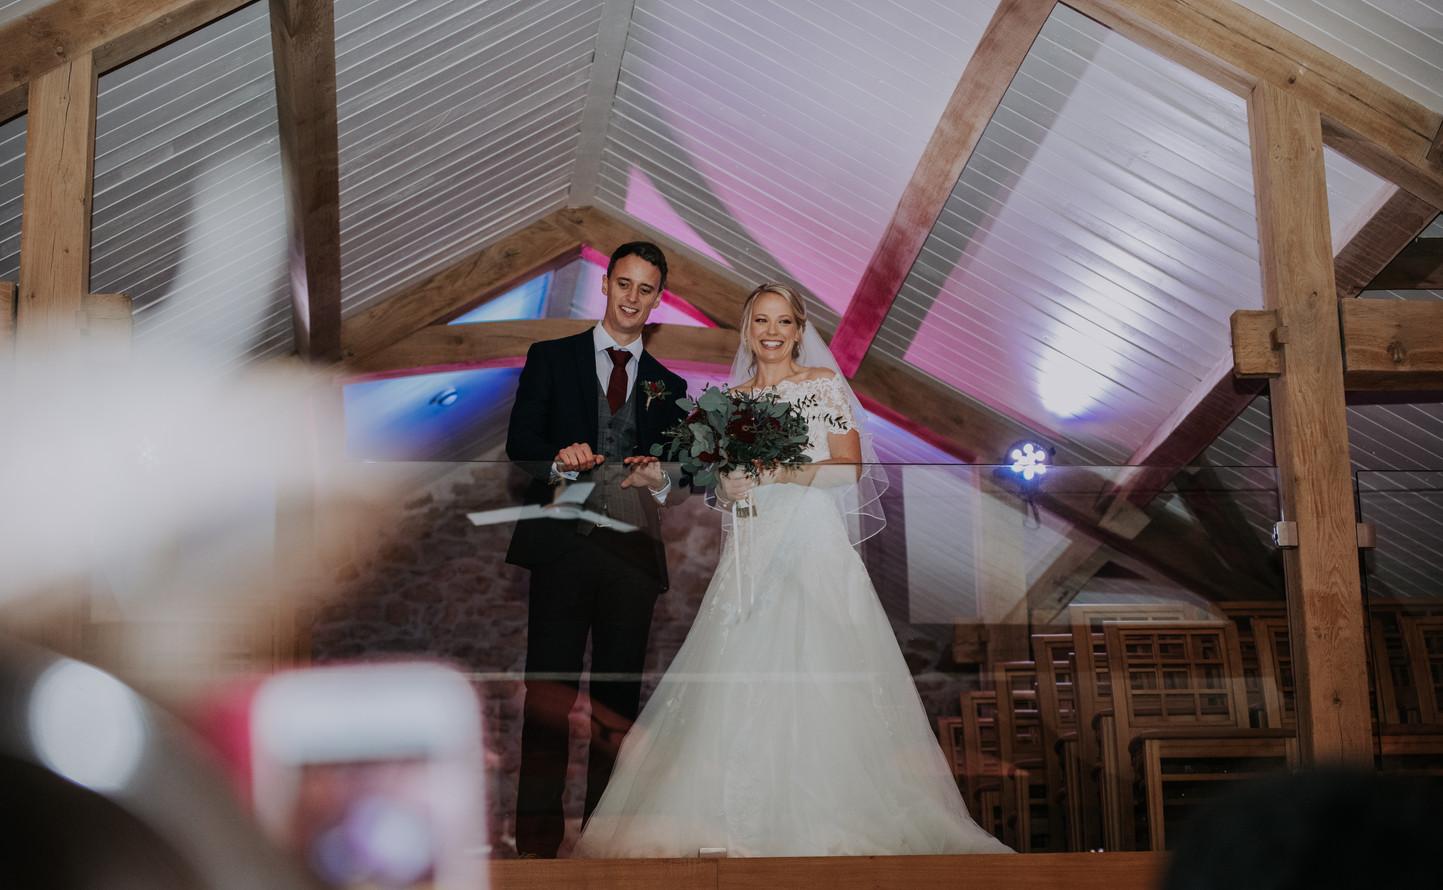 bride and groom at wedding indoors